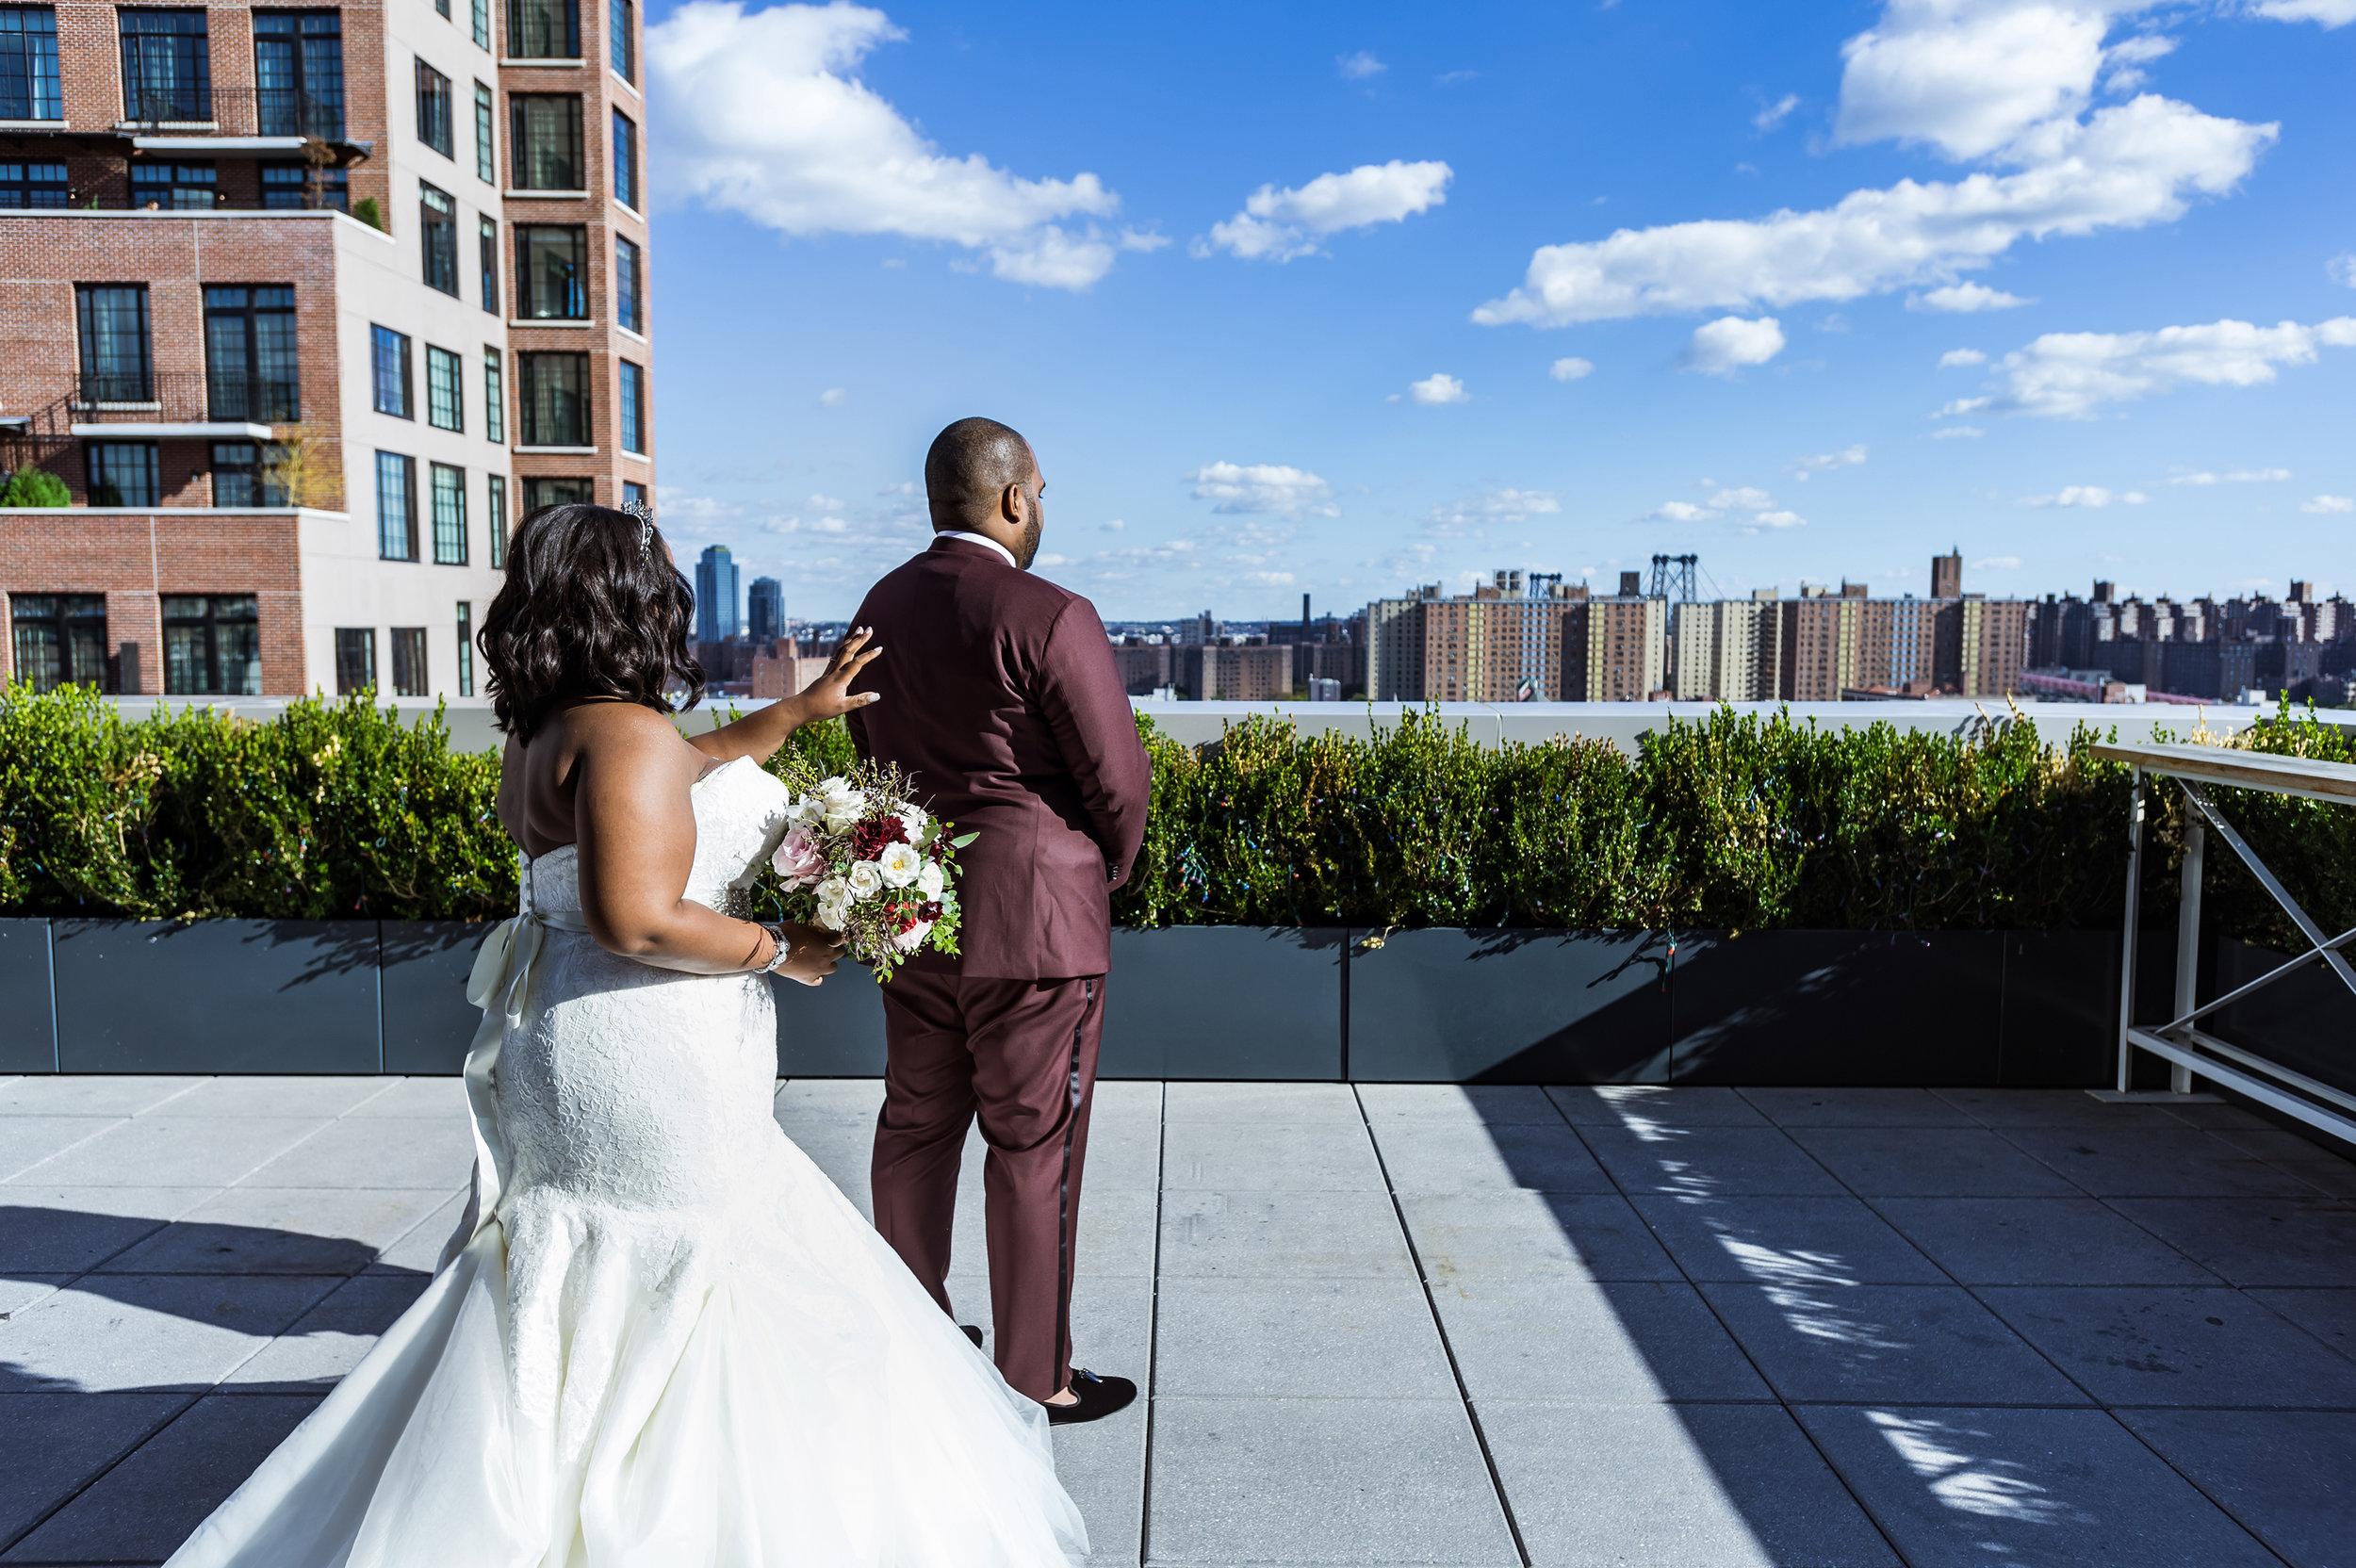 victorious-events-nyc-021-yanique-rondel-greenpoint-loft-wedding-amy-anaiz.jpg